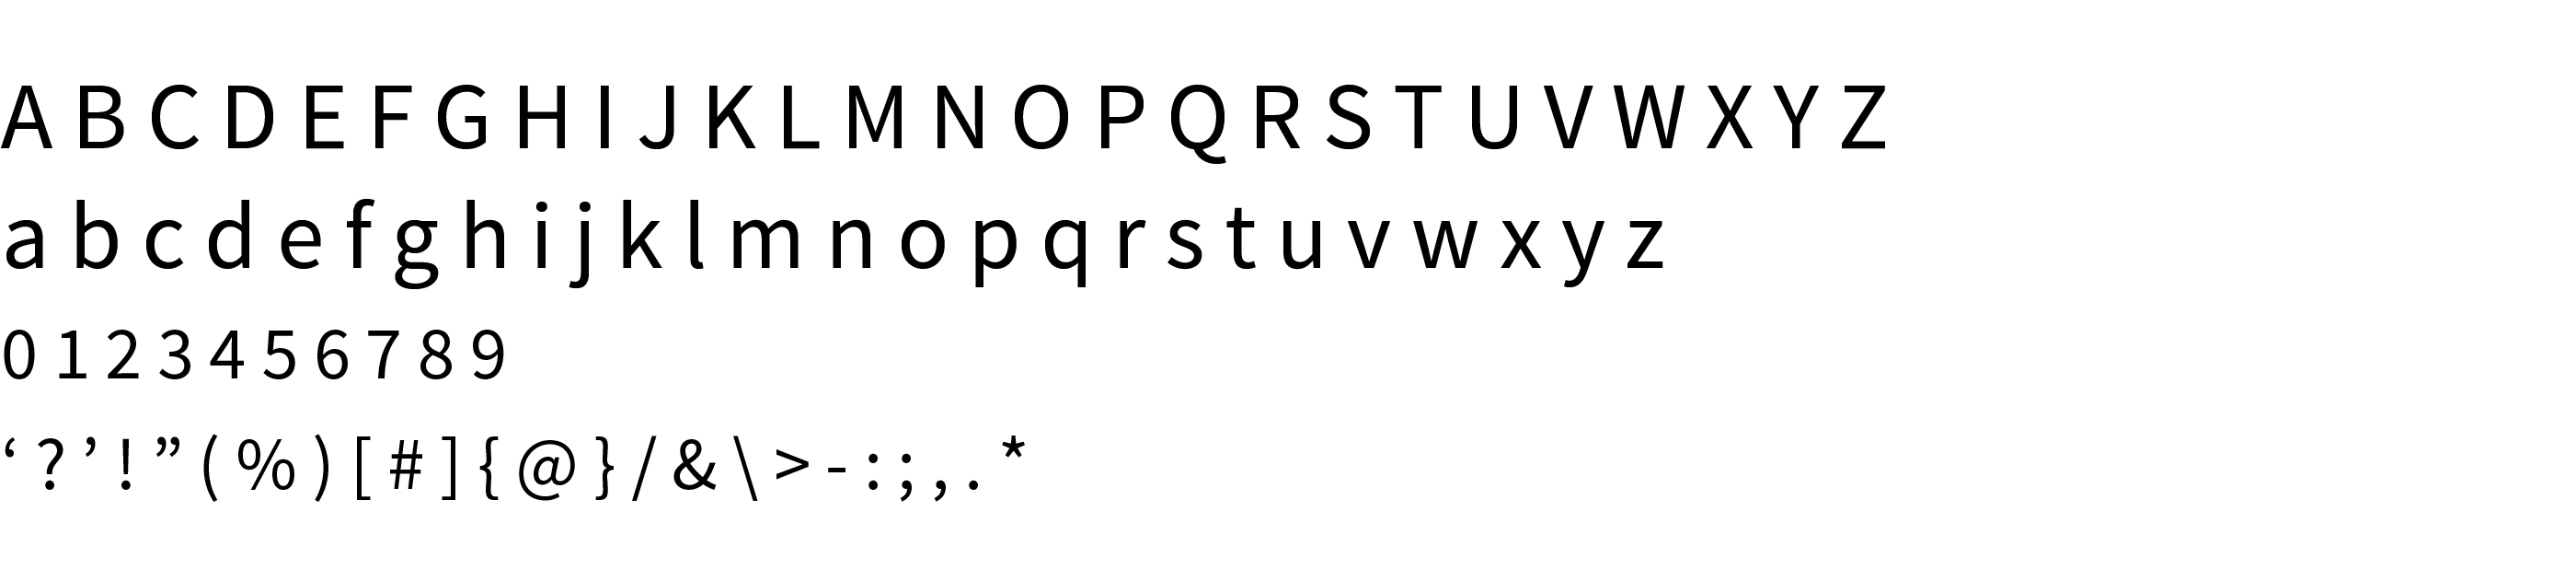 Type Specimen Source Sans Pro Regular